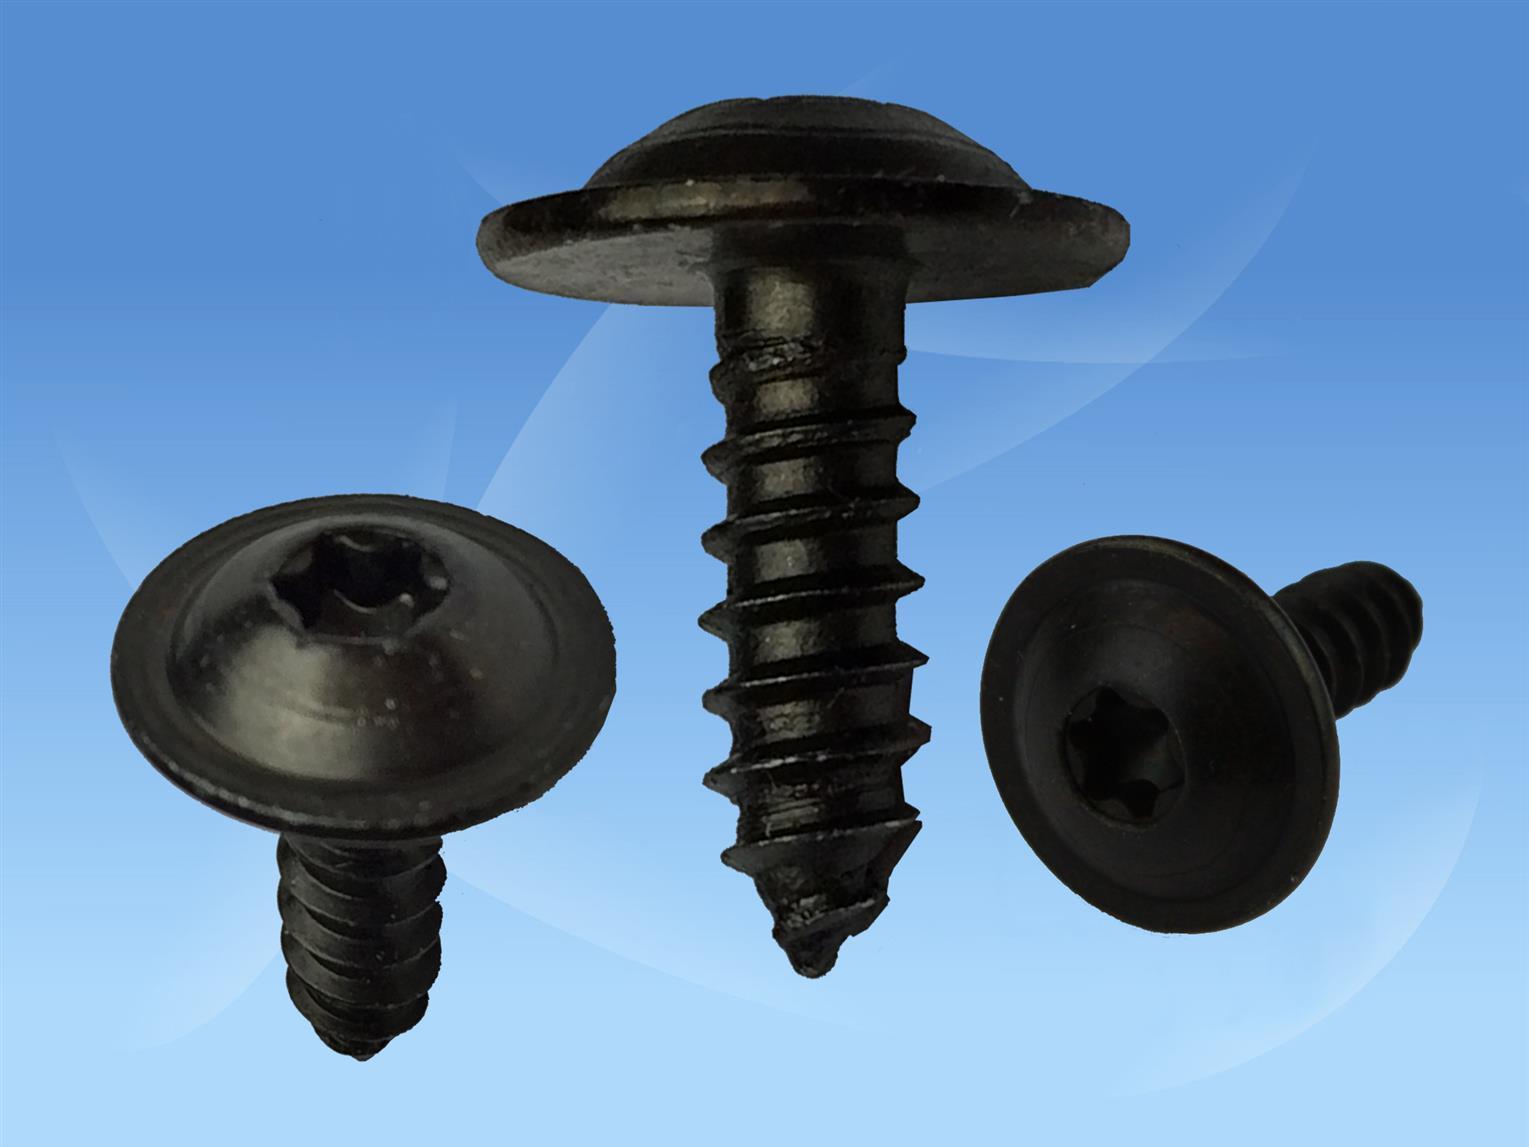 20 x torx schrauben screw tx25 4 8x16x15 universal fast. Black Bedroom Furniture Sets. Home Design Ideas